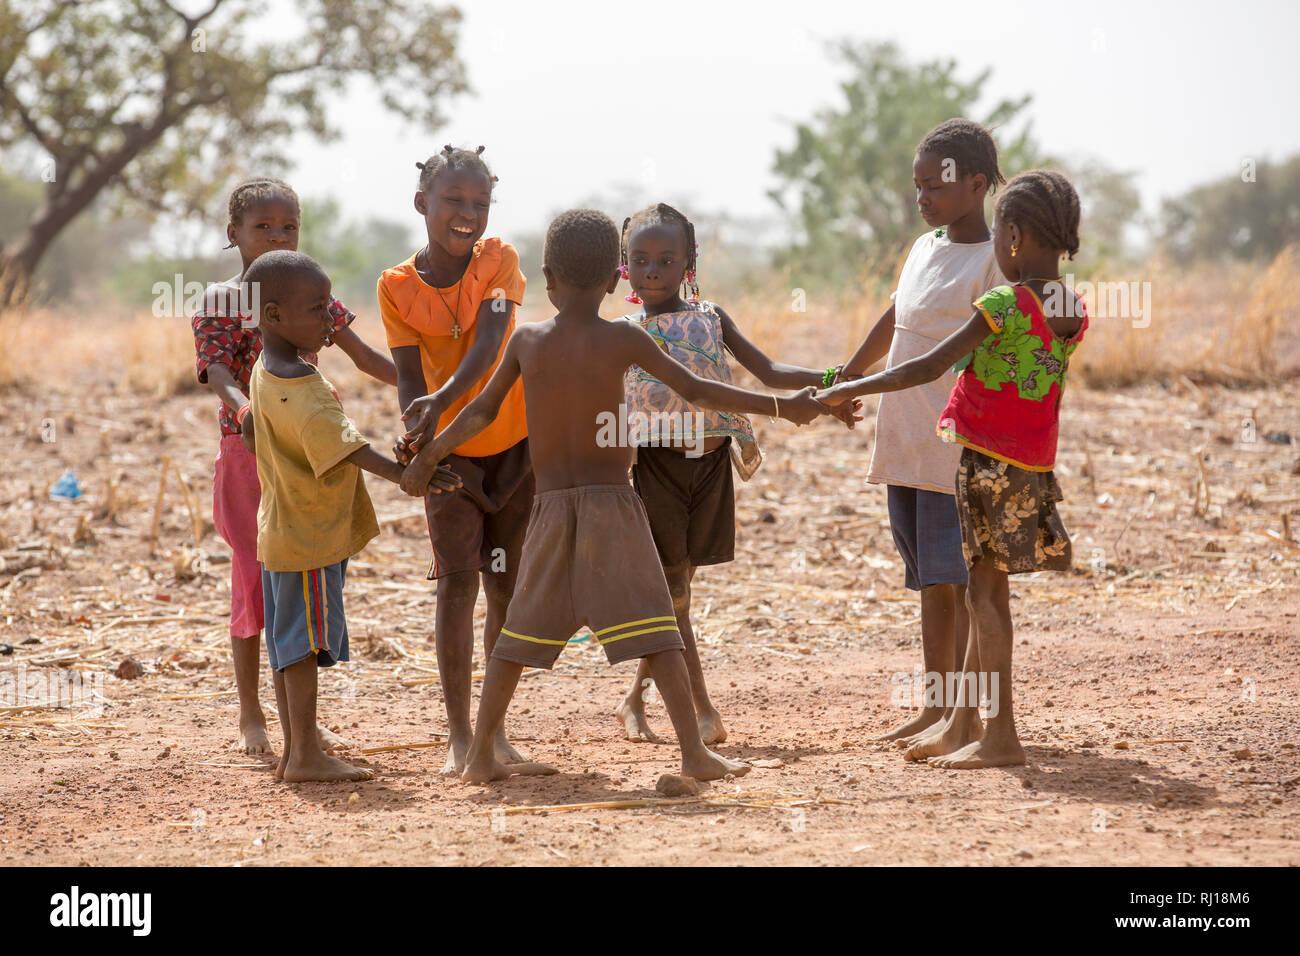 Samba village, Yako Province, Burkina Faso; children playing together. Stock Photo